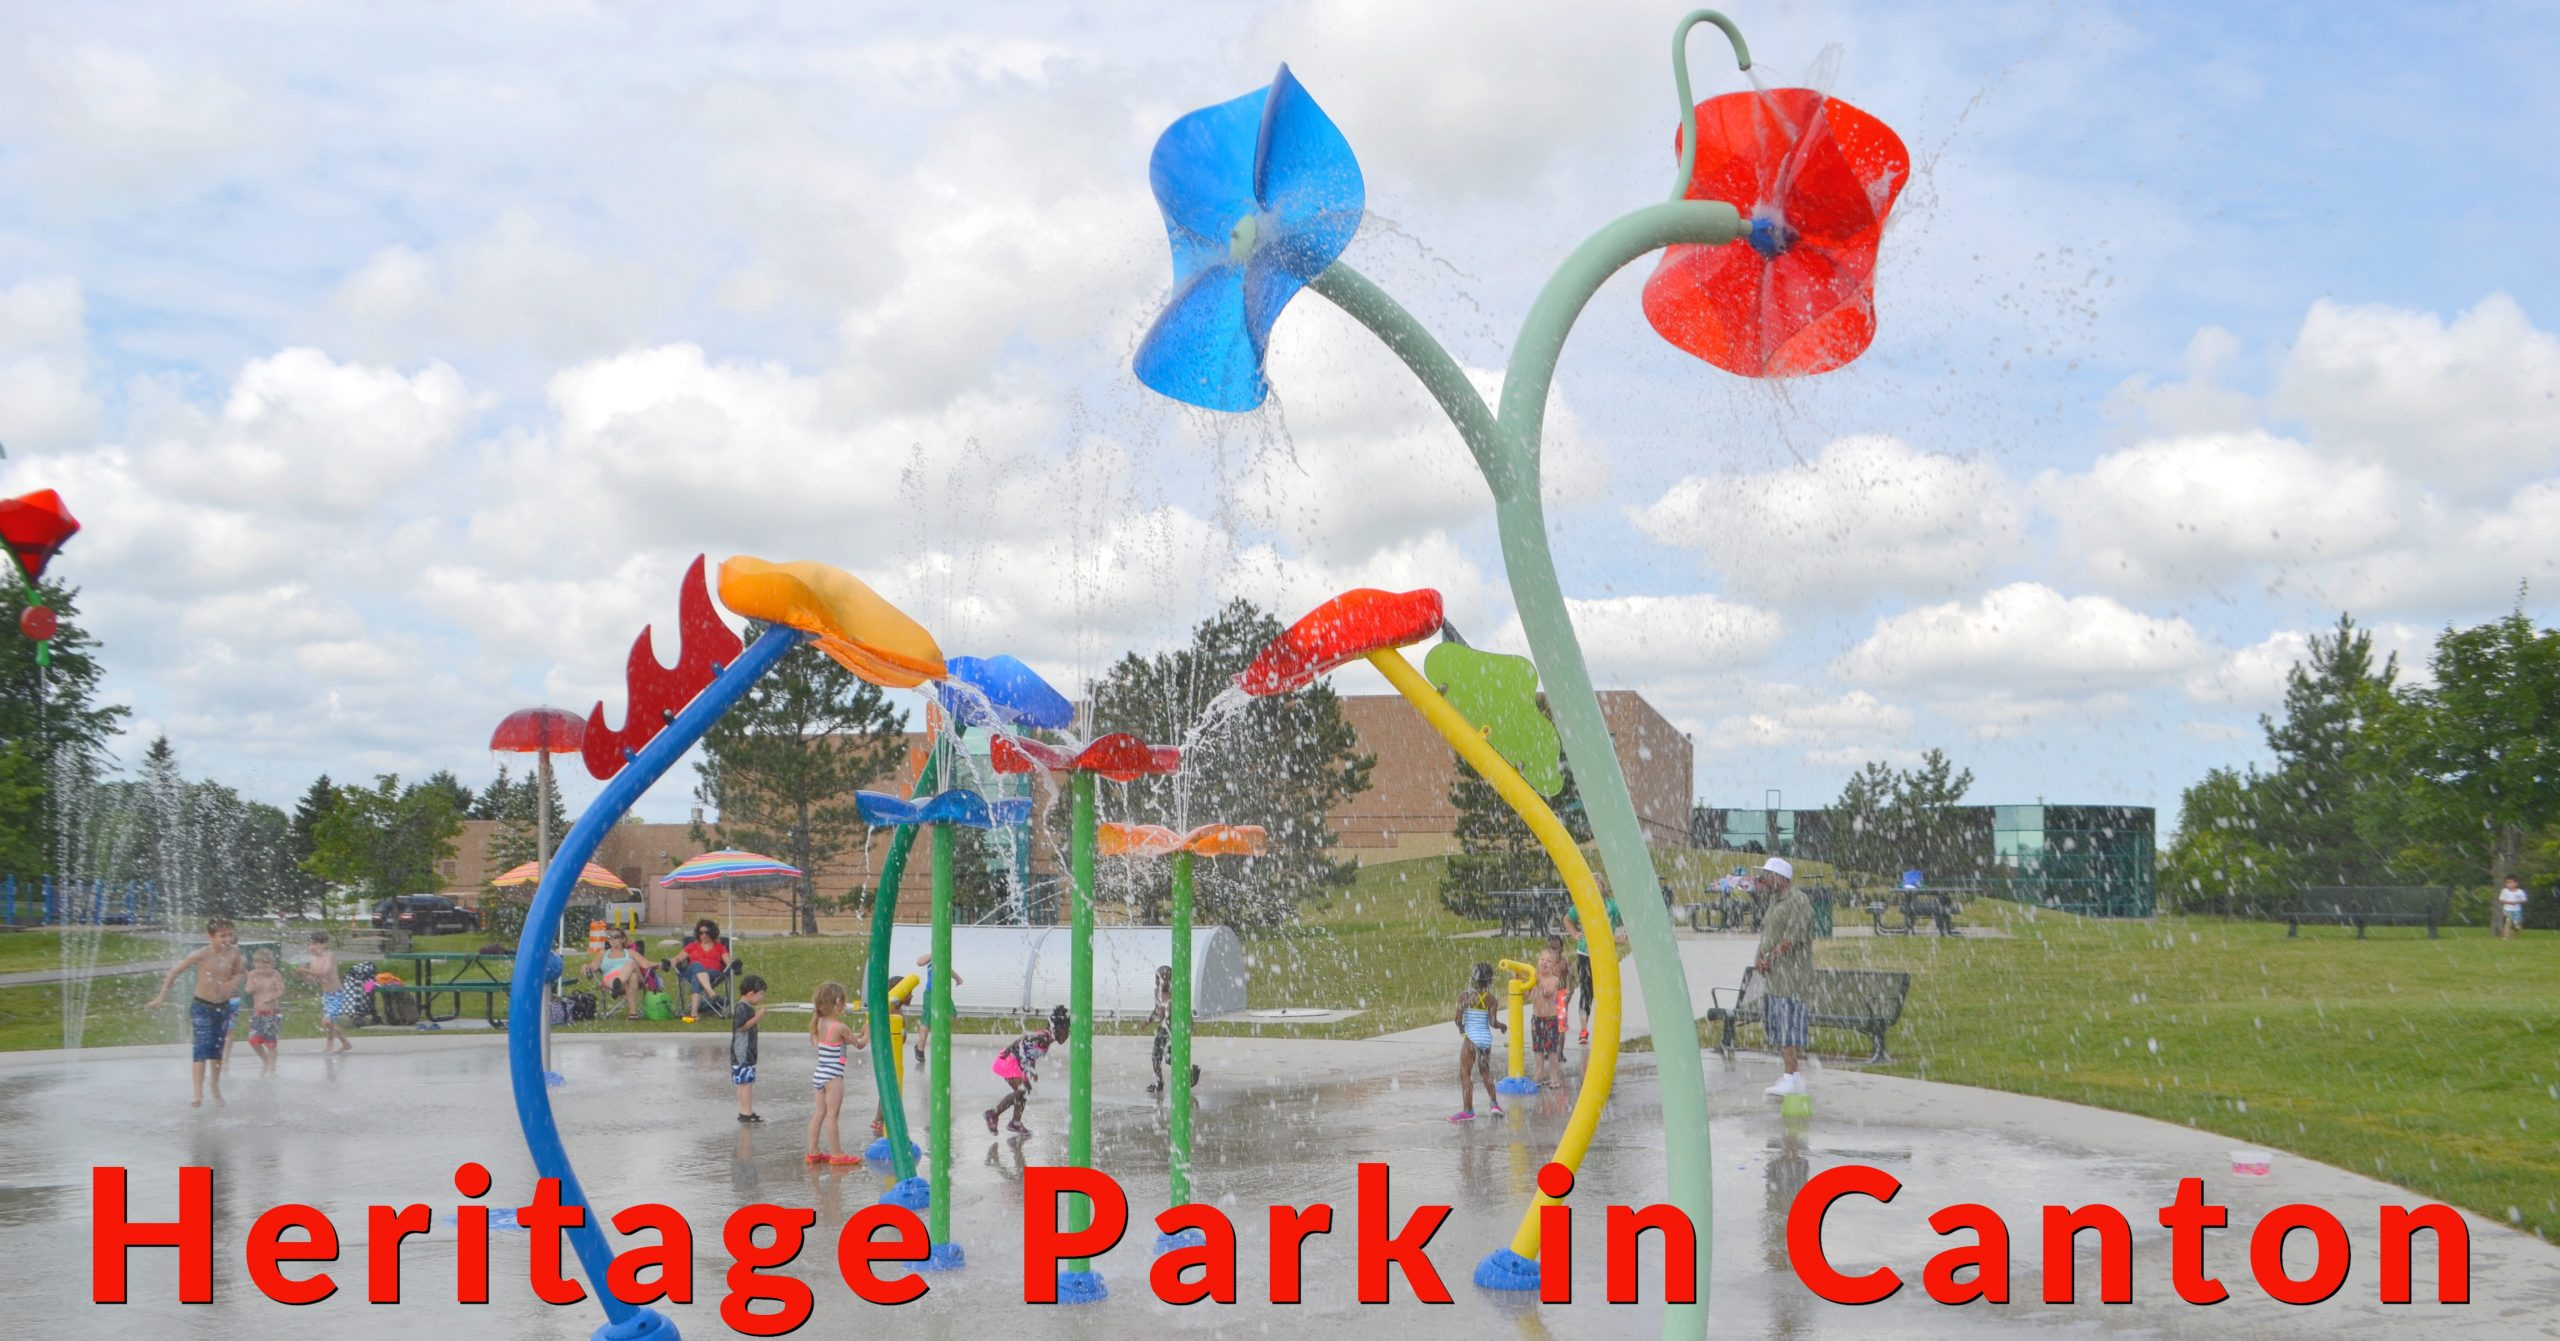 Canton Heritage Park – Splash Pad and Playground